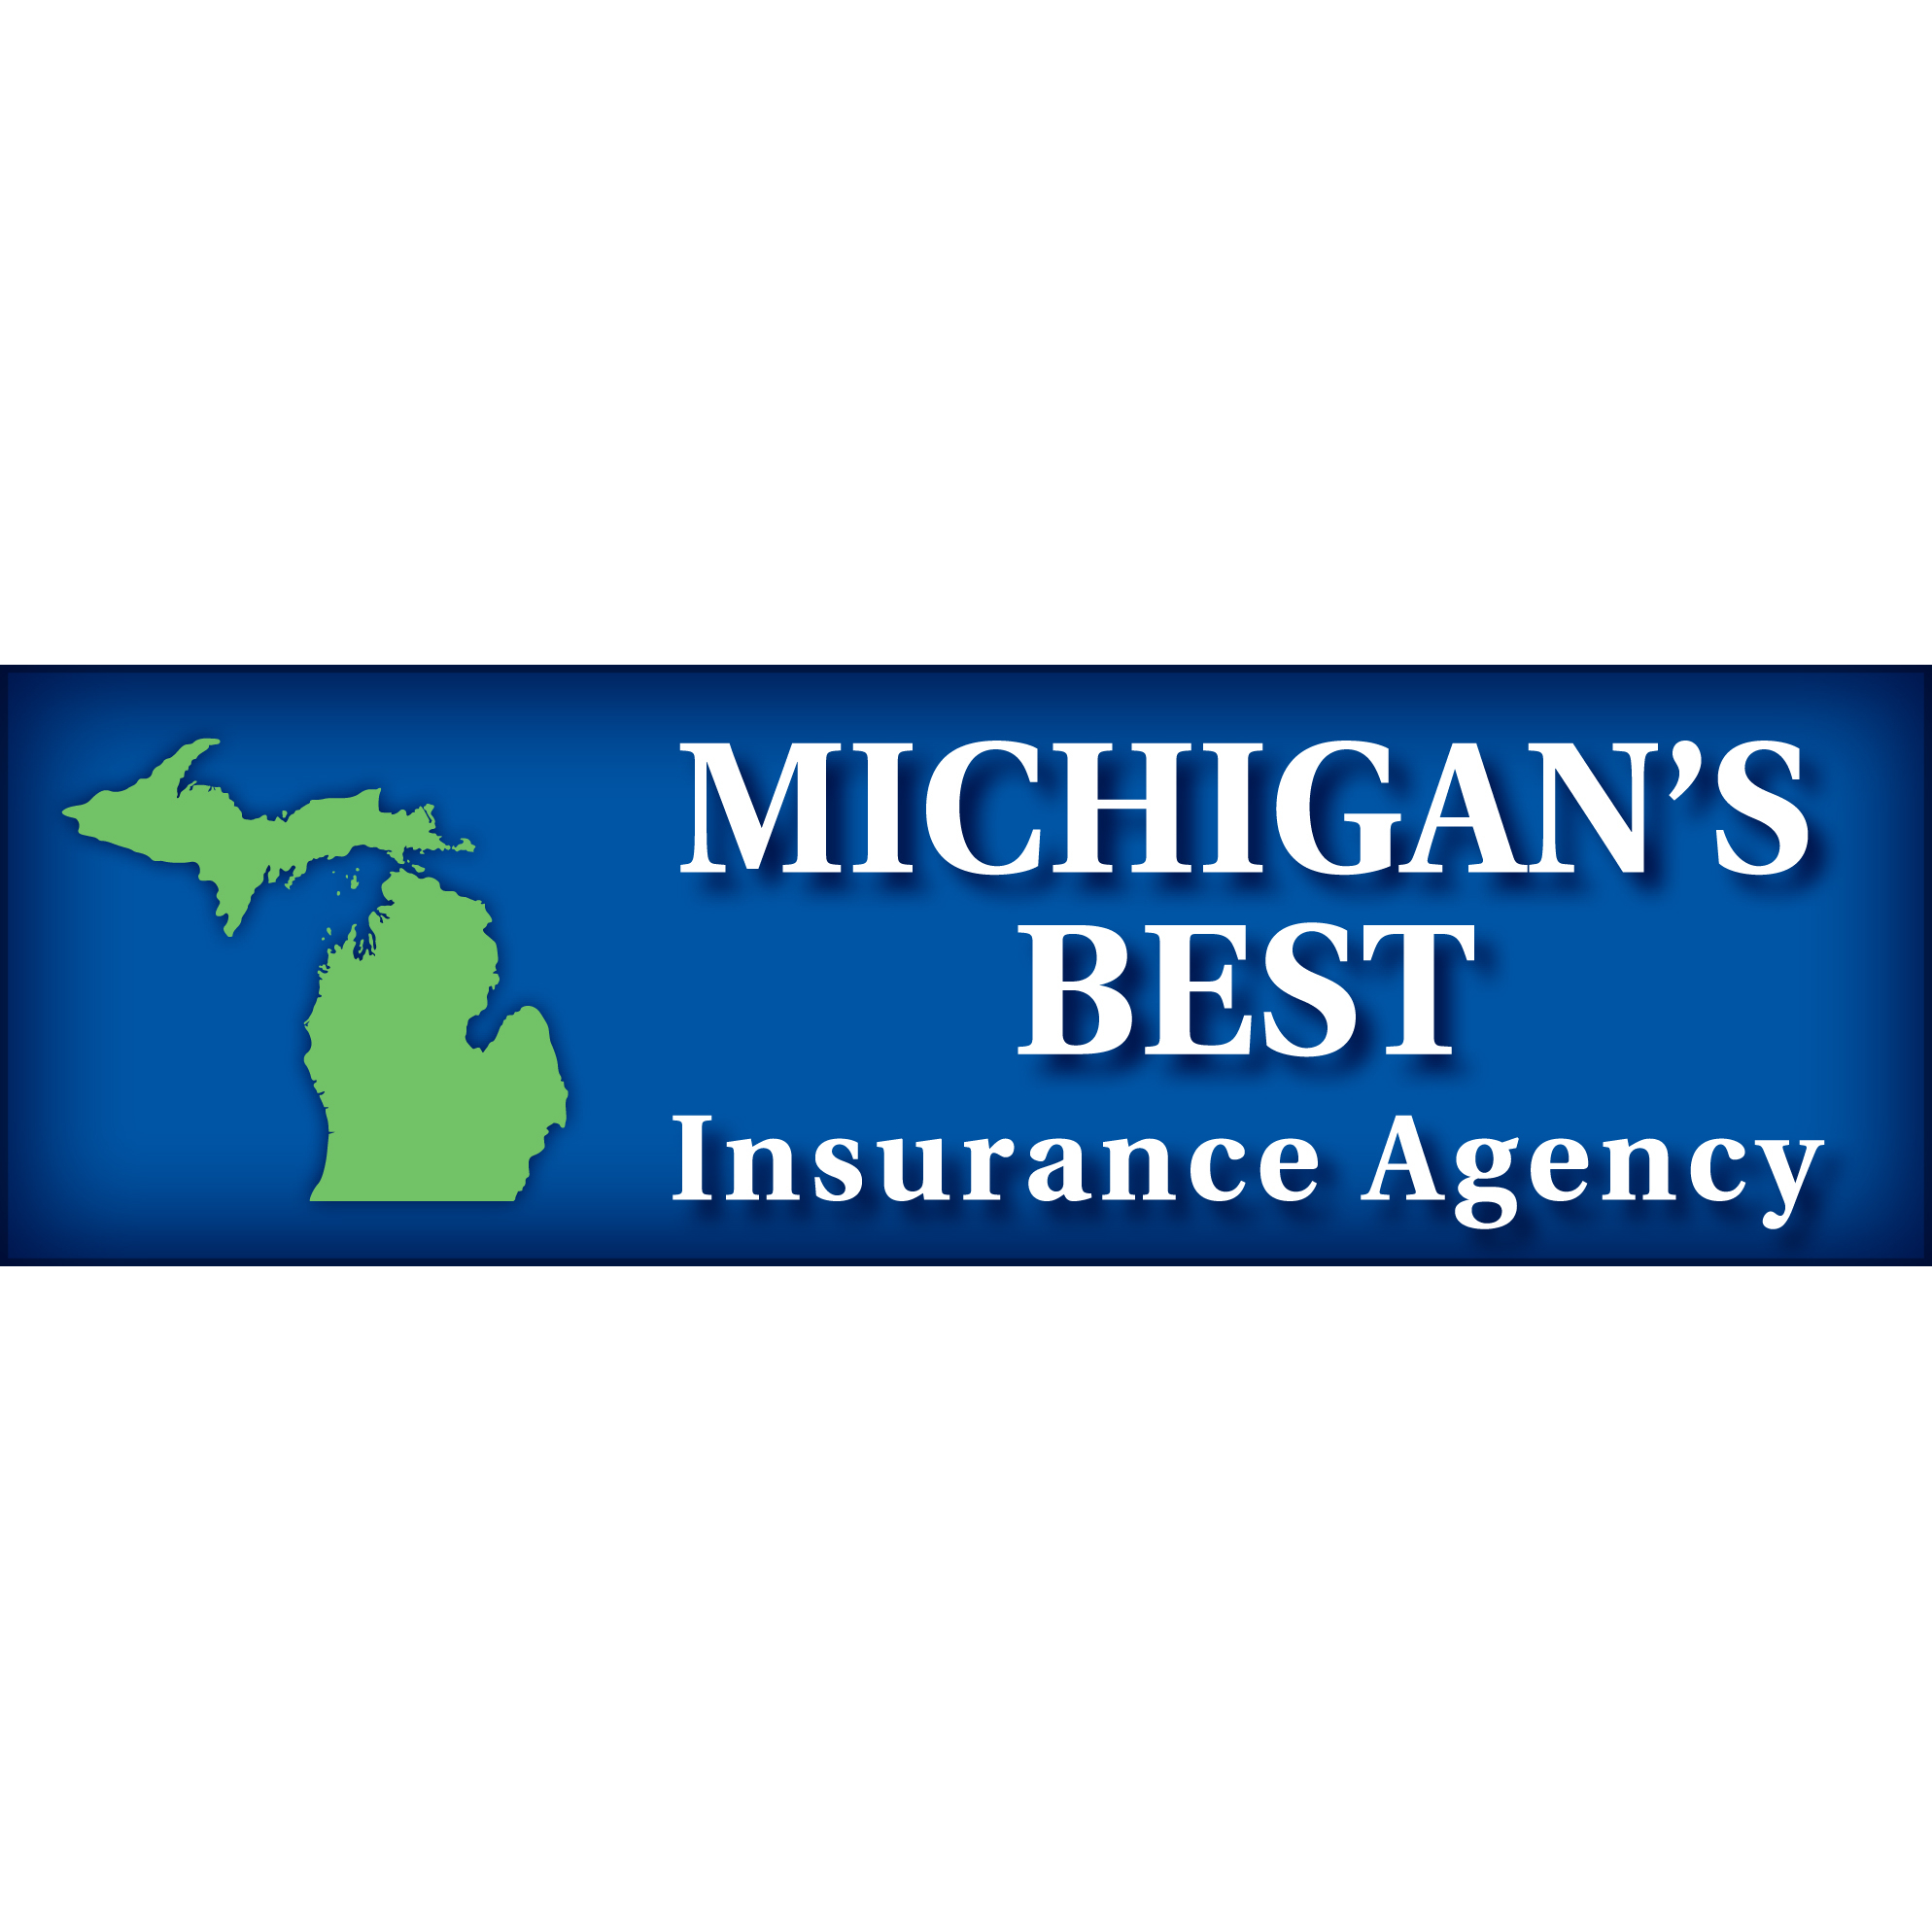 Michigan's Best Insurance Agency